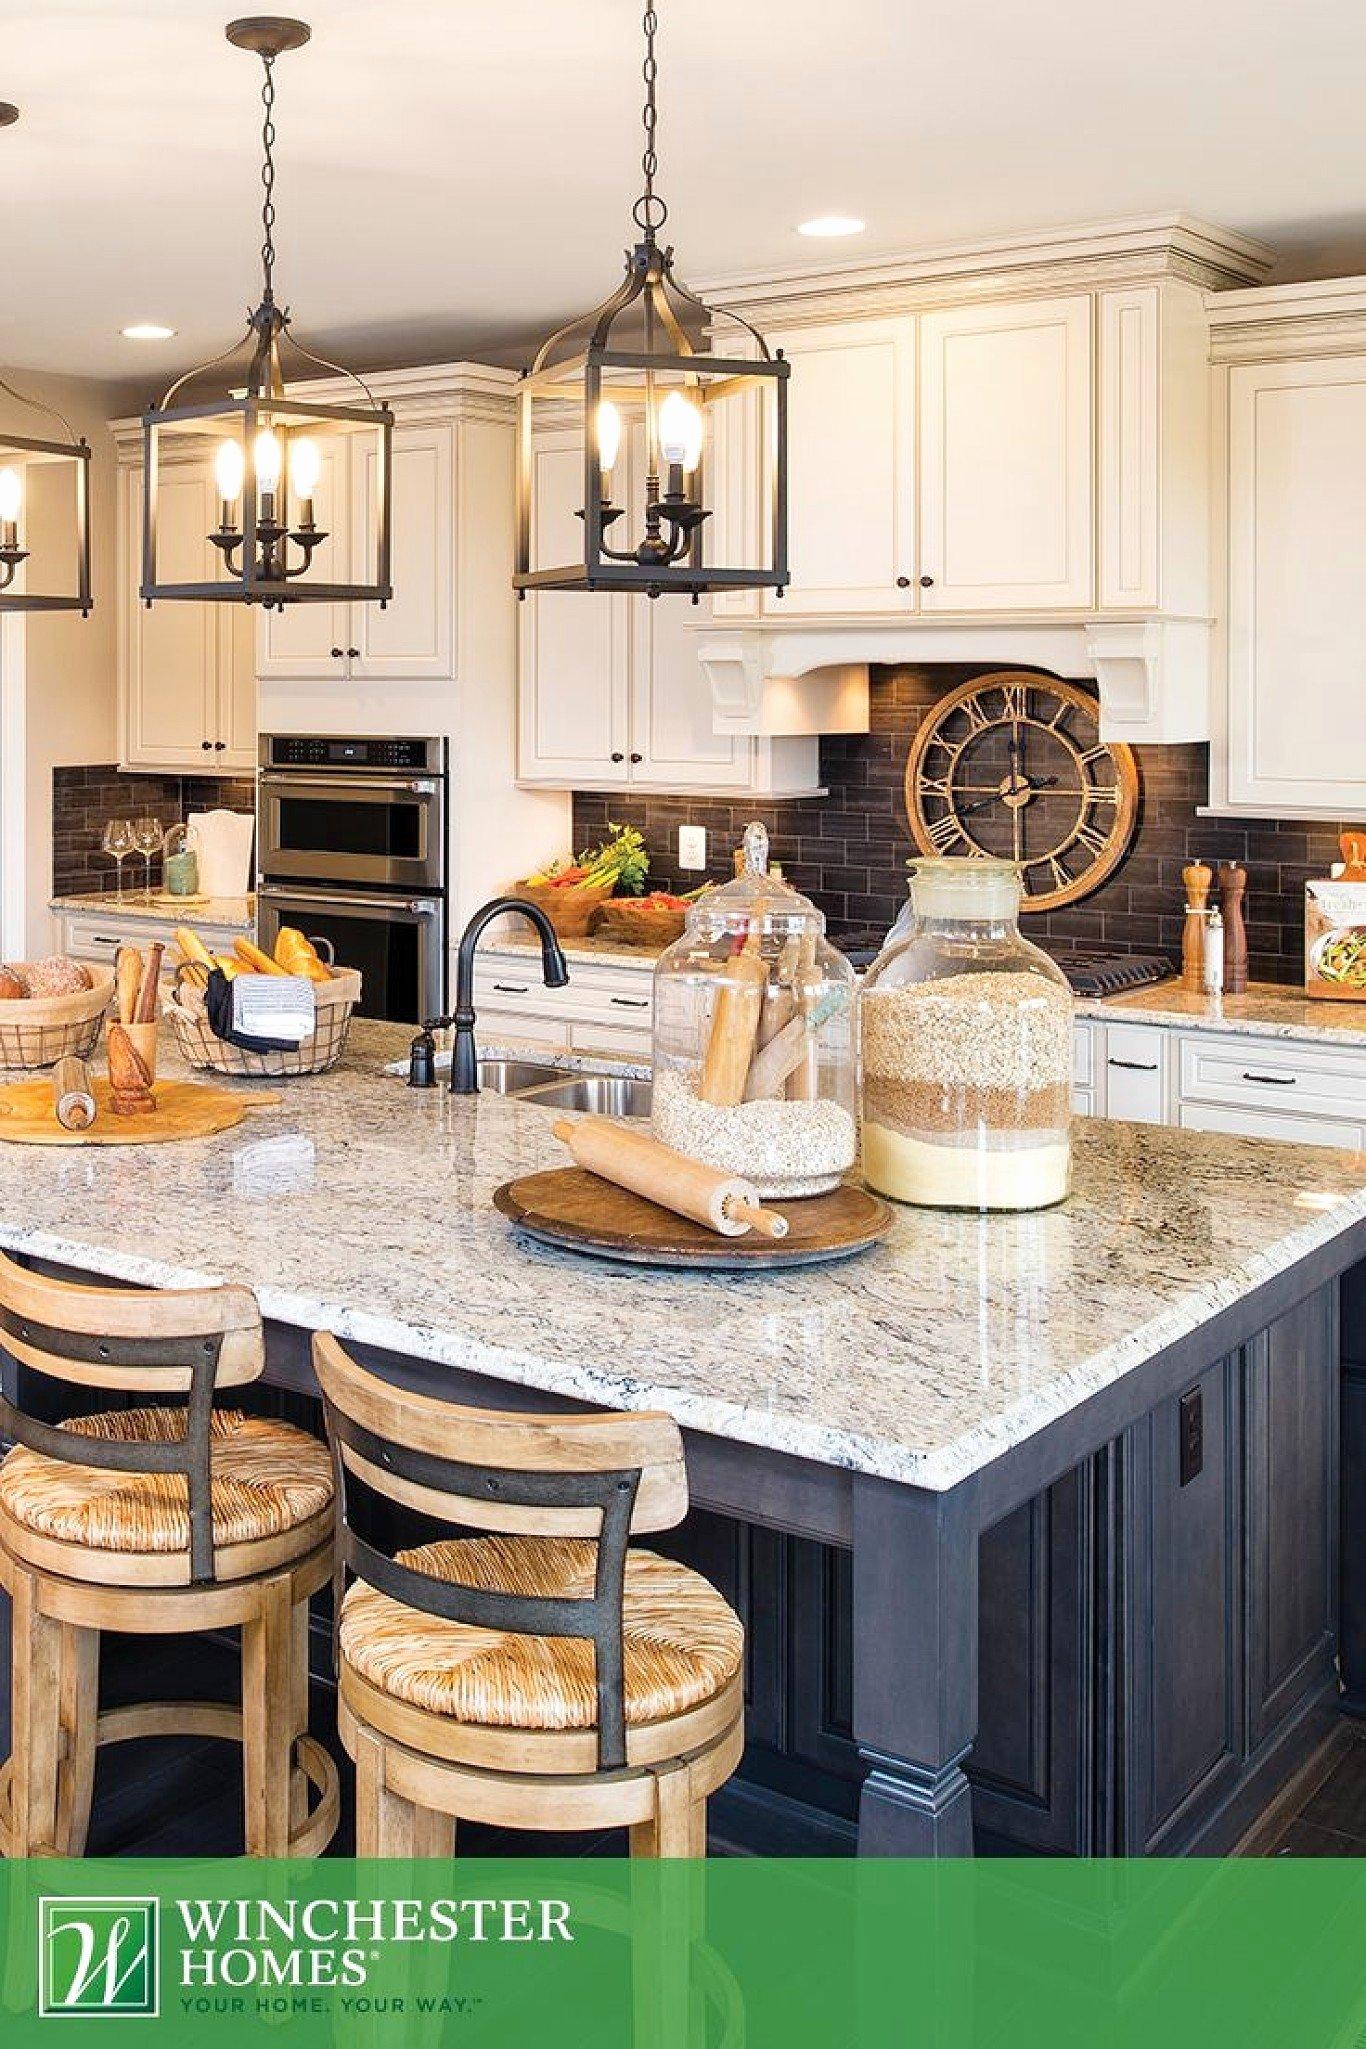 10 Attractive Kitchen Island Lighting Ideas Pictures 20 lovely kitchen island pendant lighting ideas best home template 2020